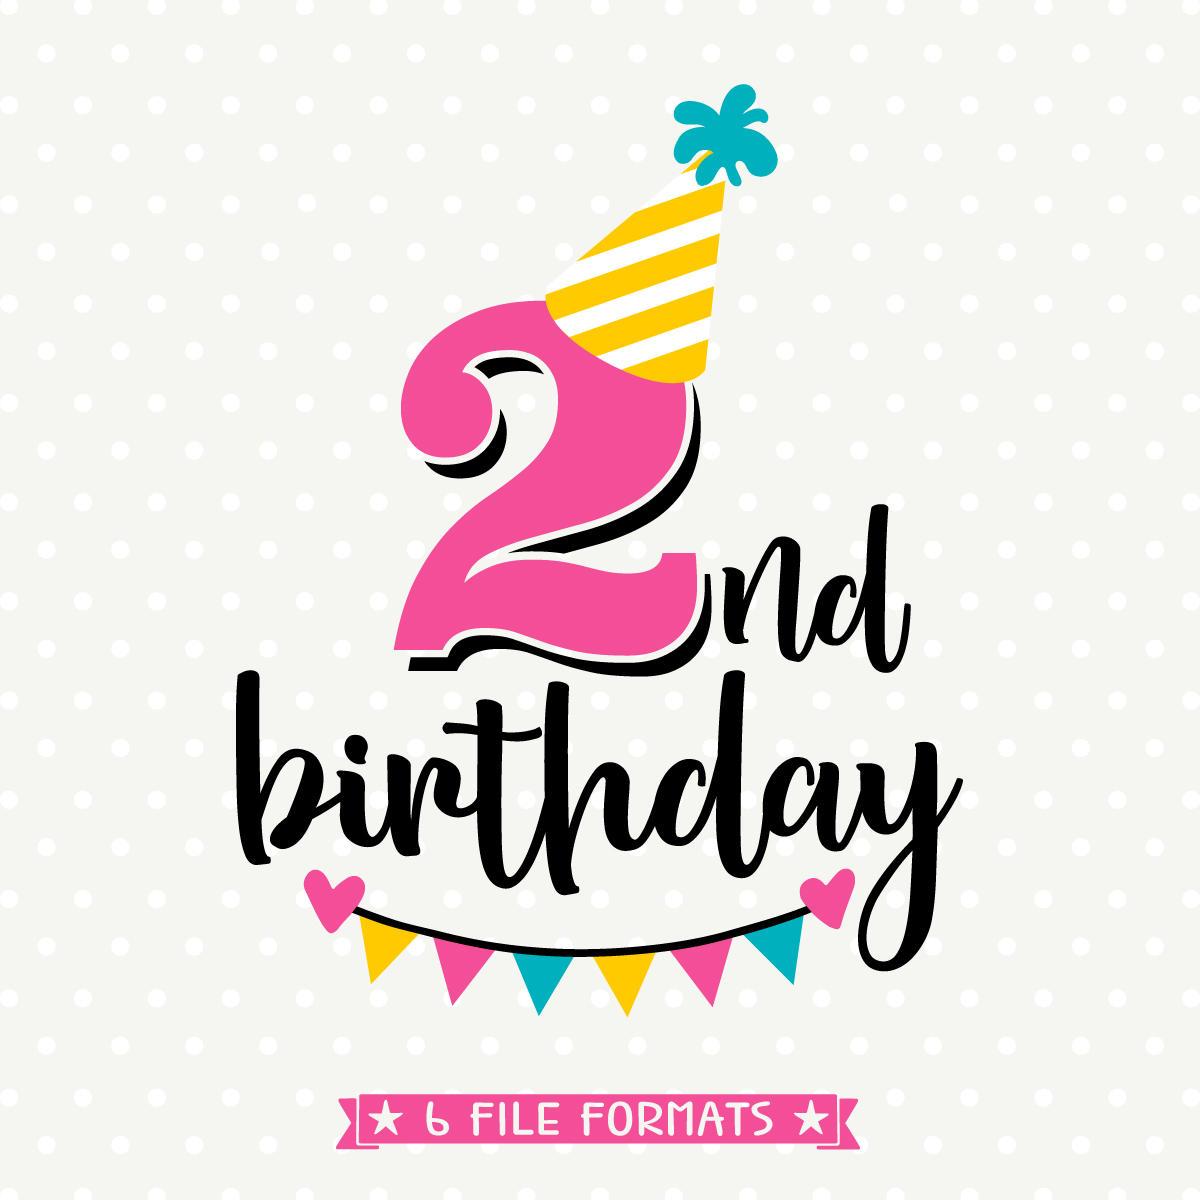 2nd Birthday SVG Second Birthday Cut File Birthday Iron On